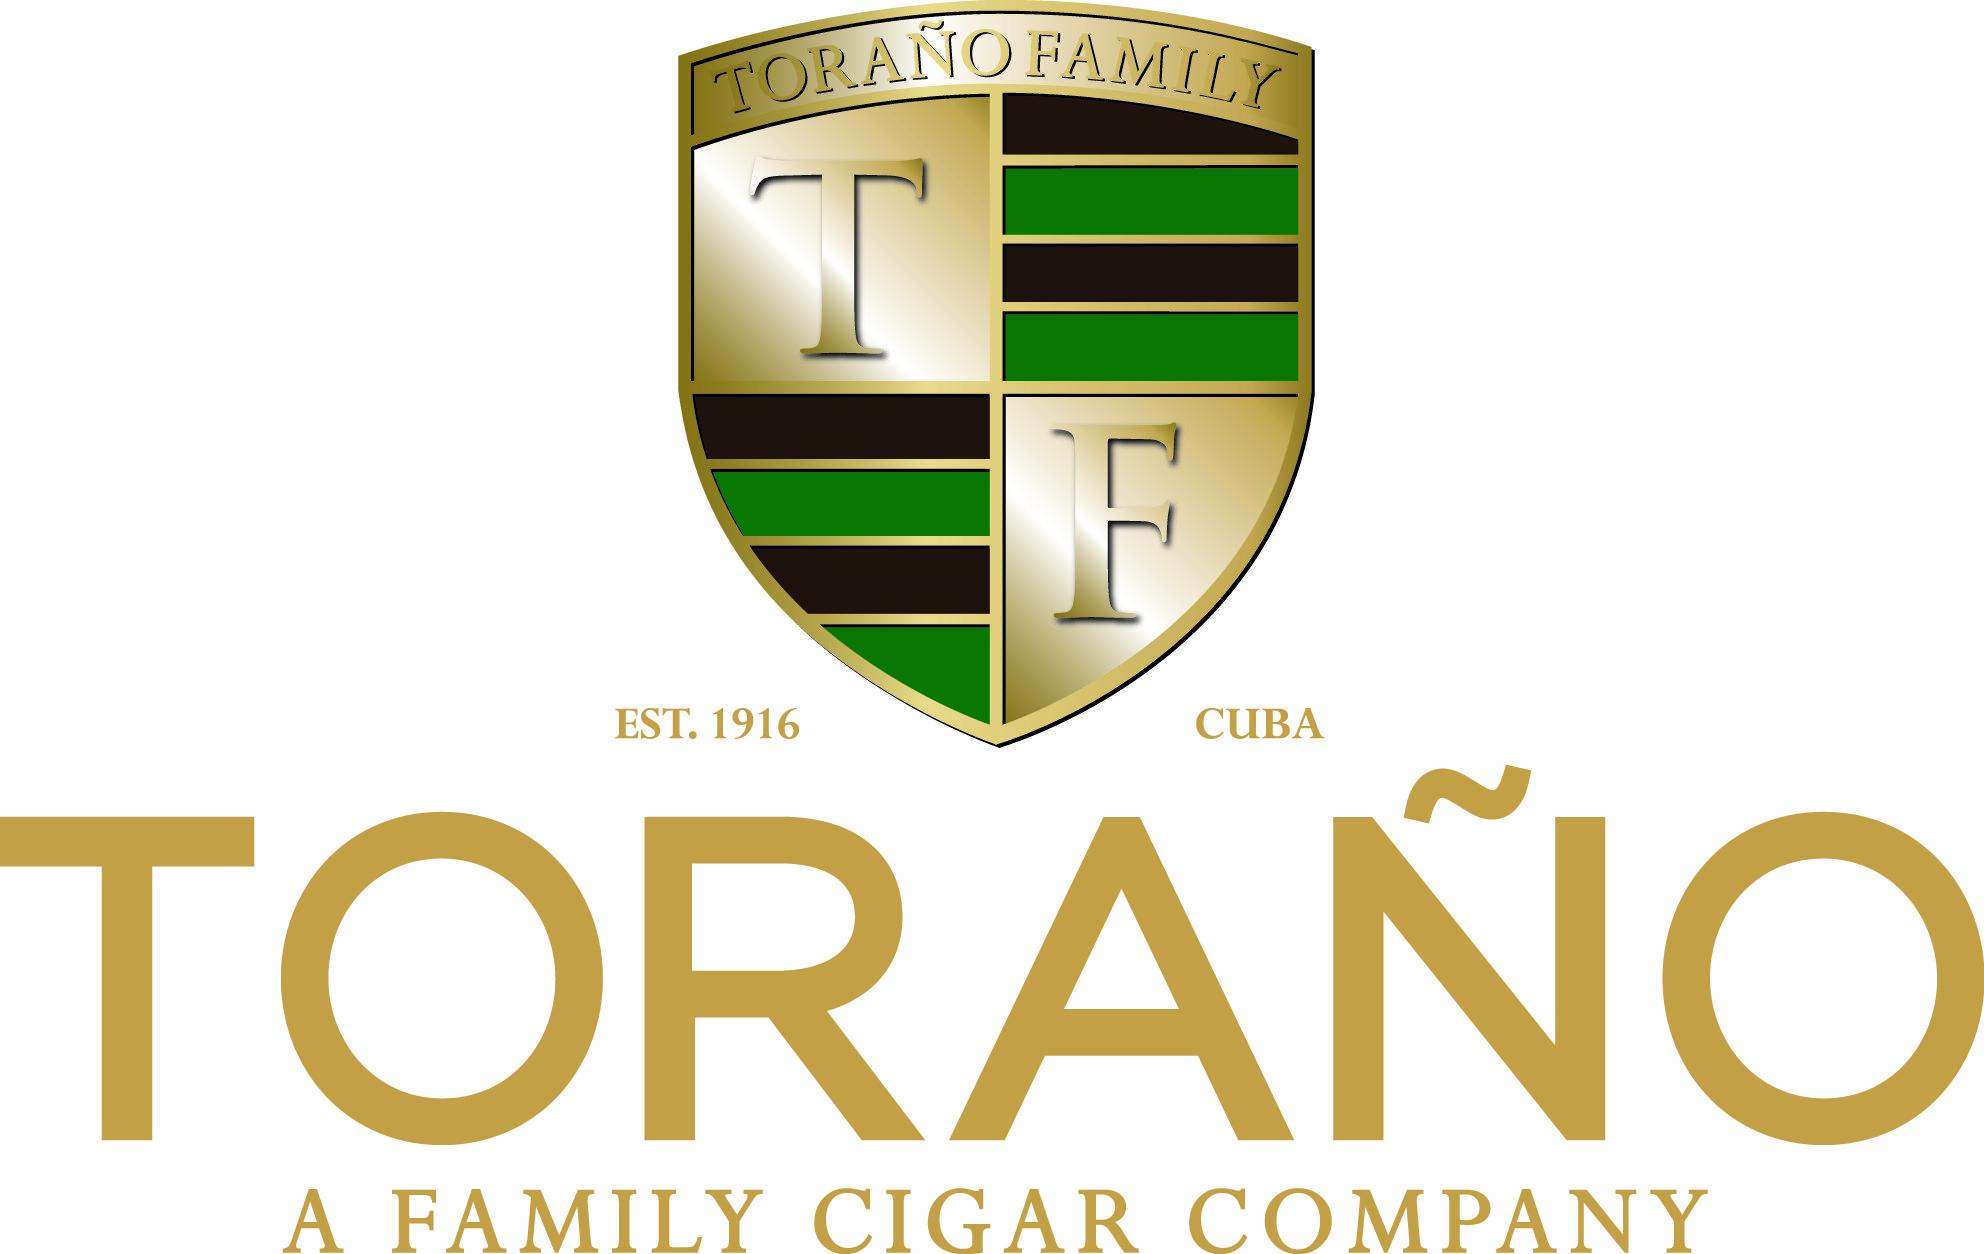 Cigar News: Toraño Family Cigar Co. Announces The Blends From The Vault Tour